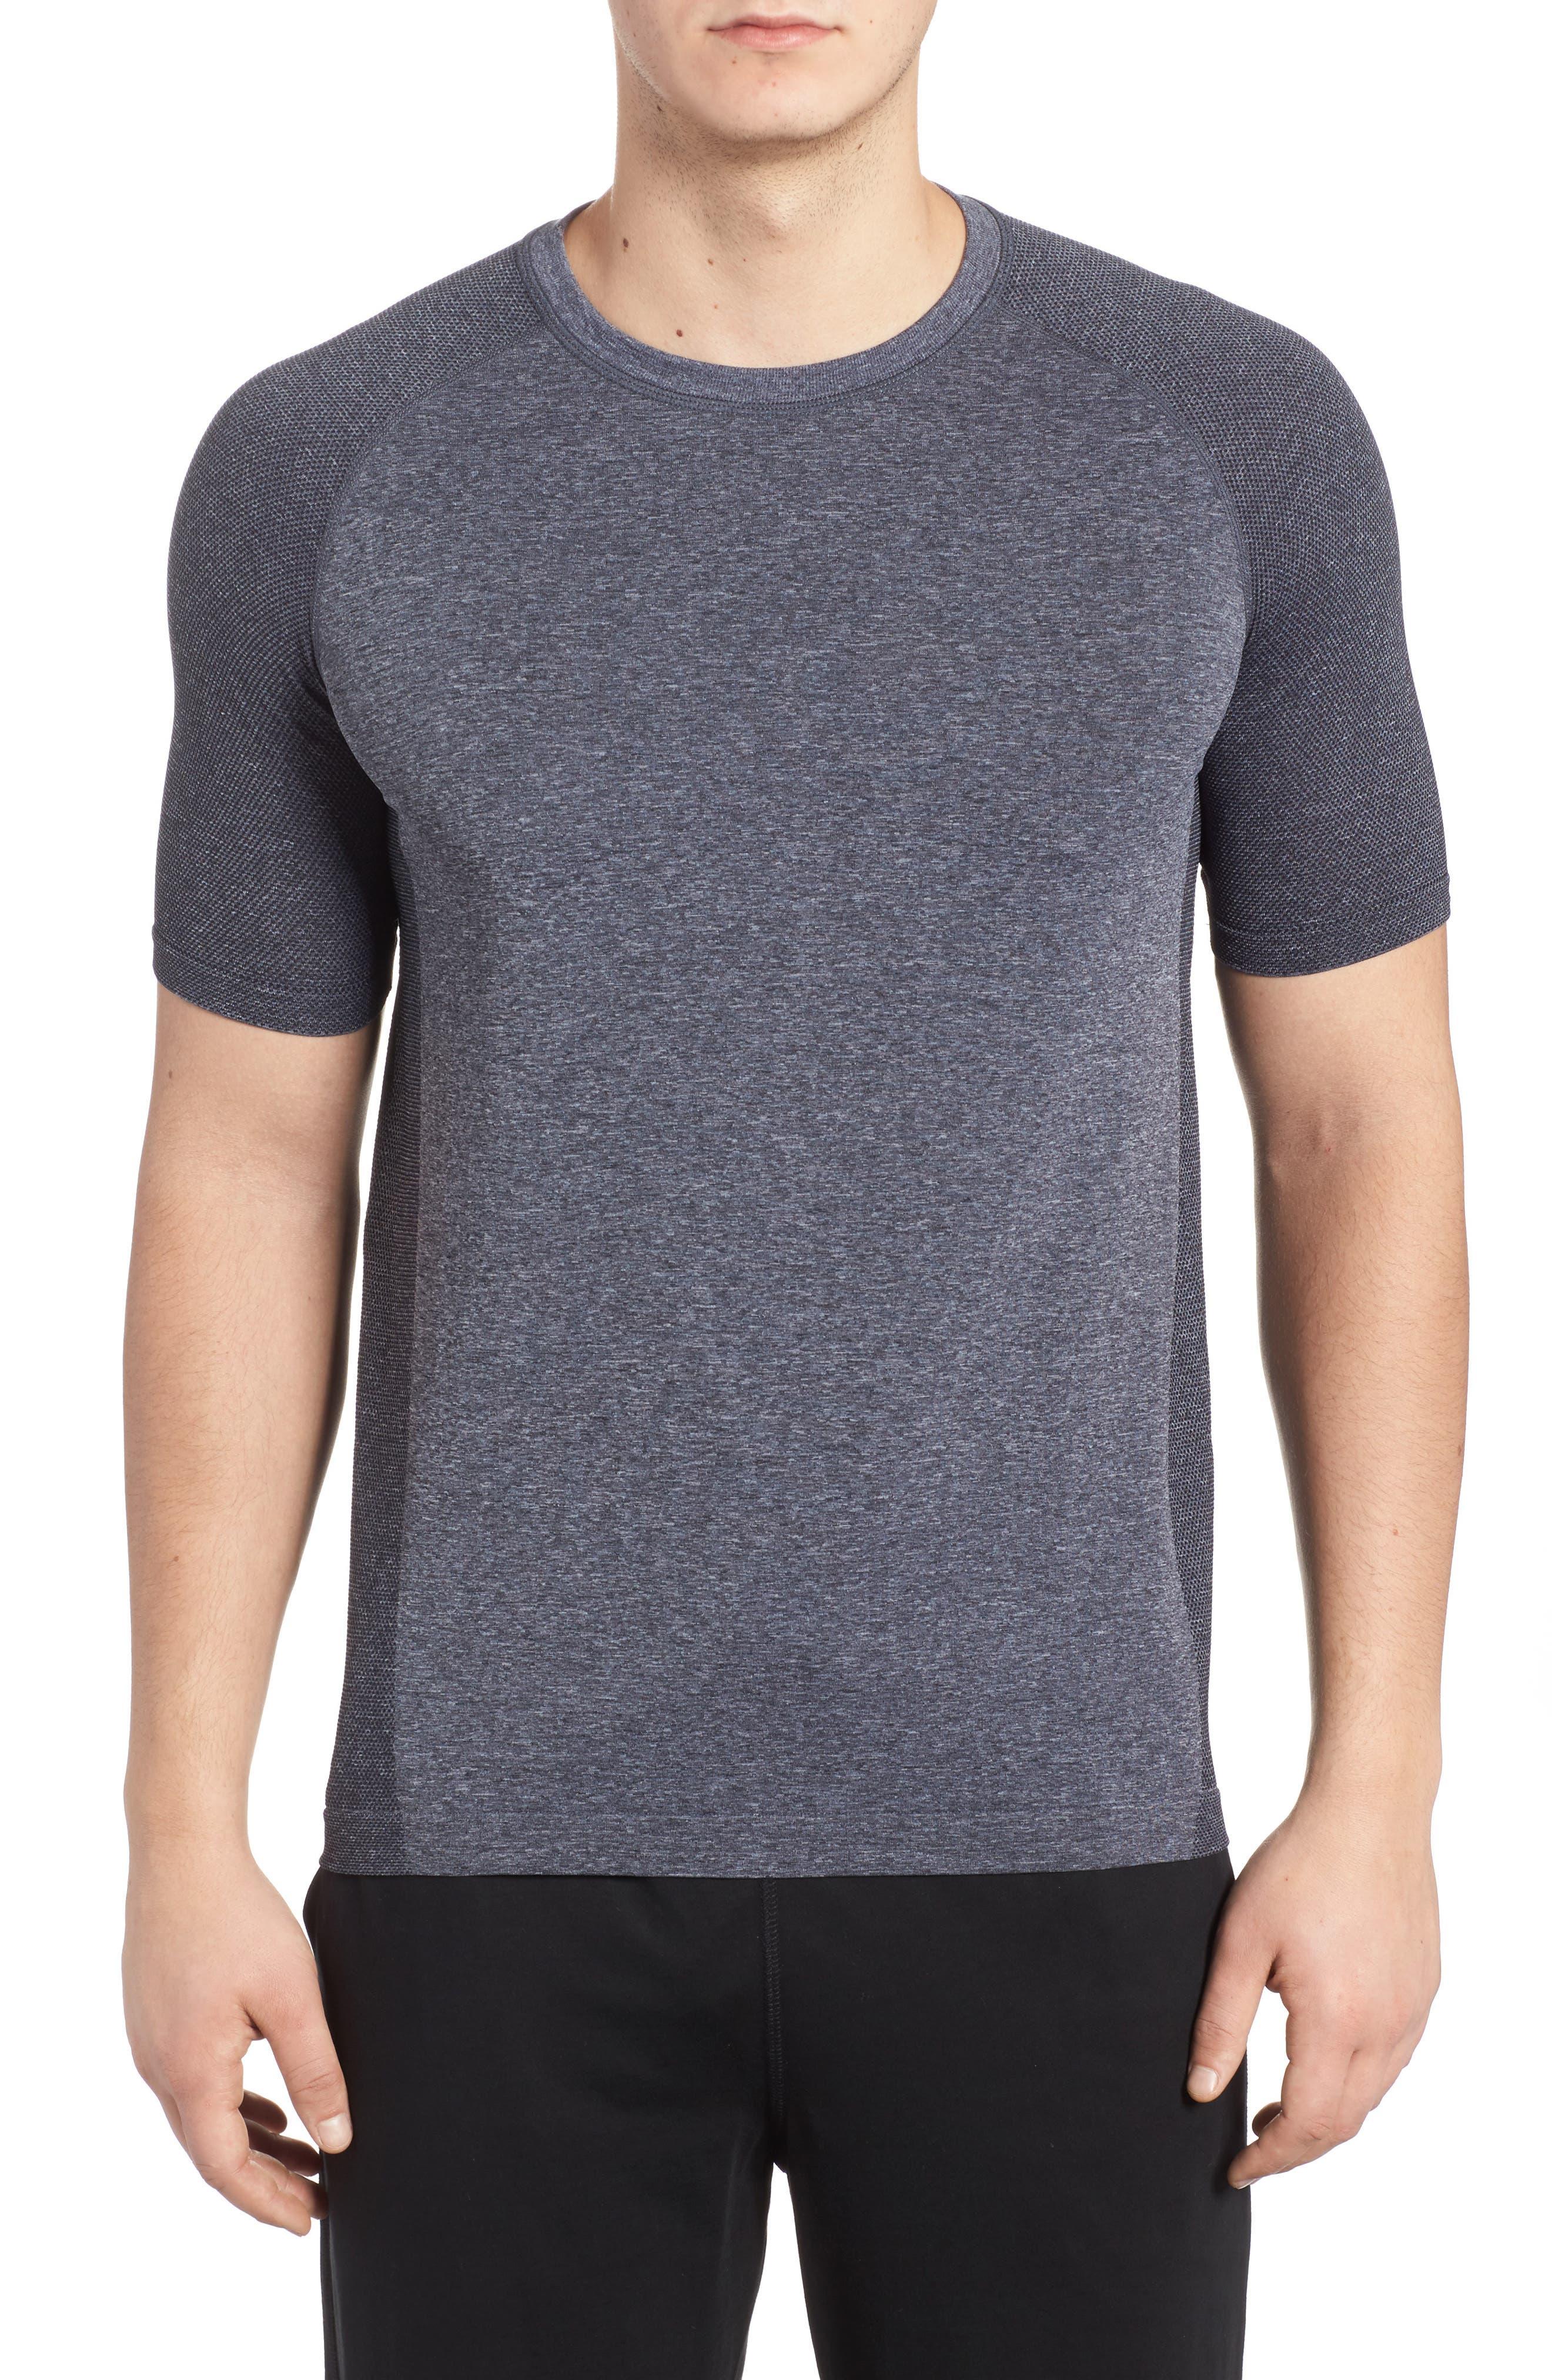 Vapor Performance T-Shirt,                         Main,                         color, ASPHALT